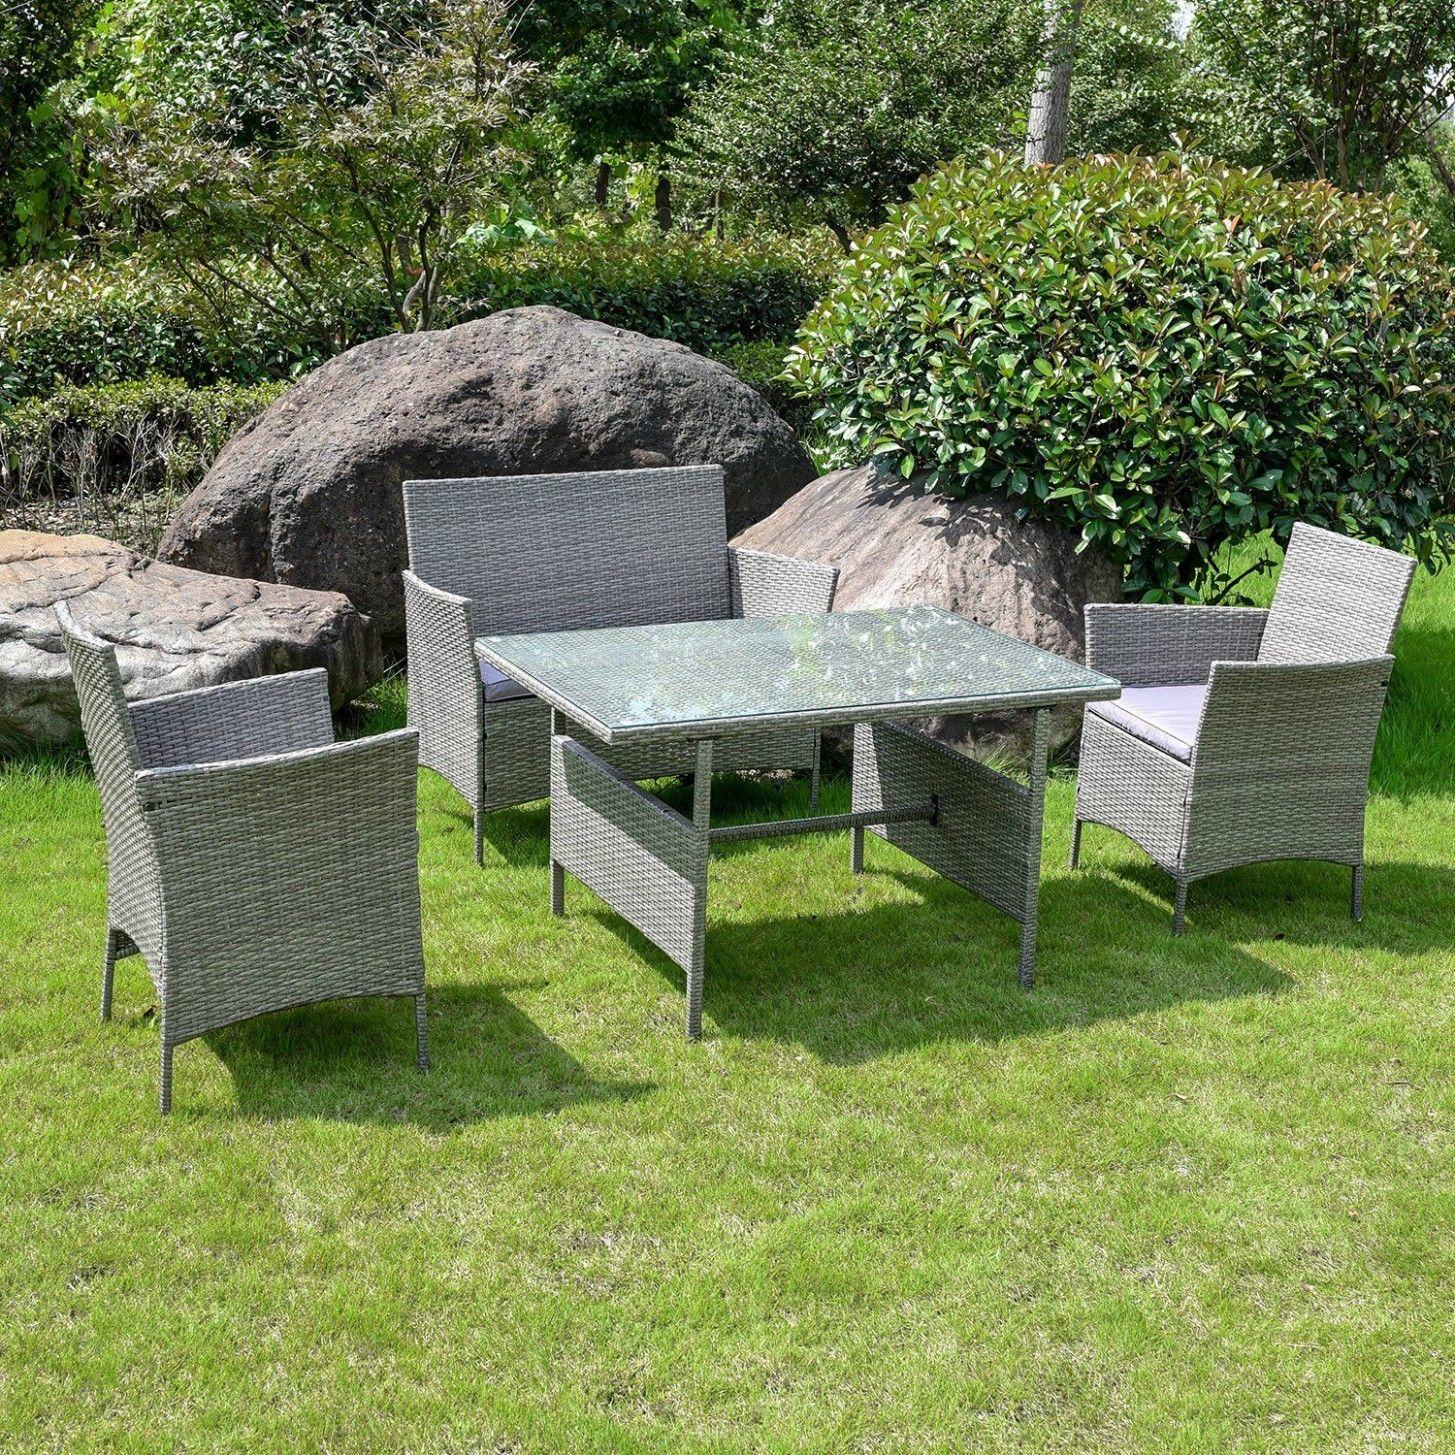 Garden Chairs Homestore And More in 9  Rattan garden furniture